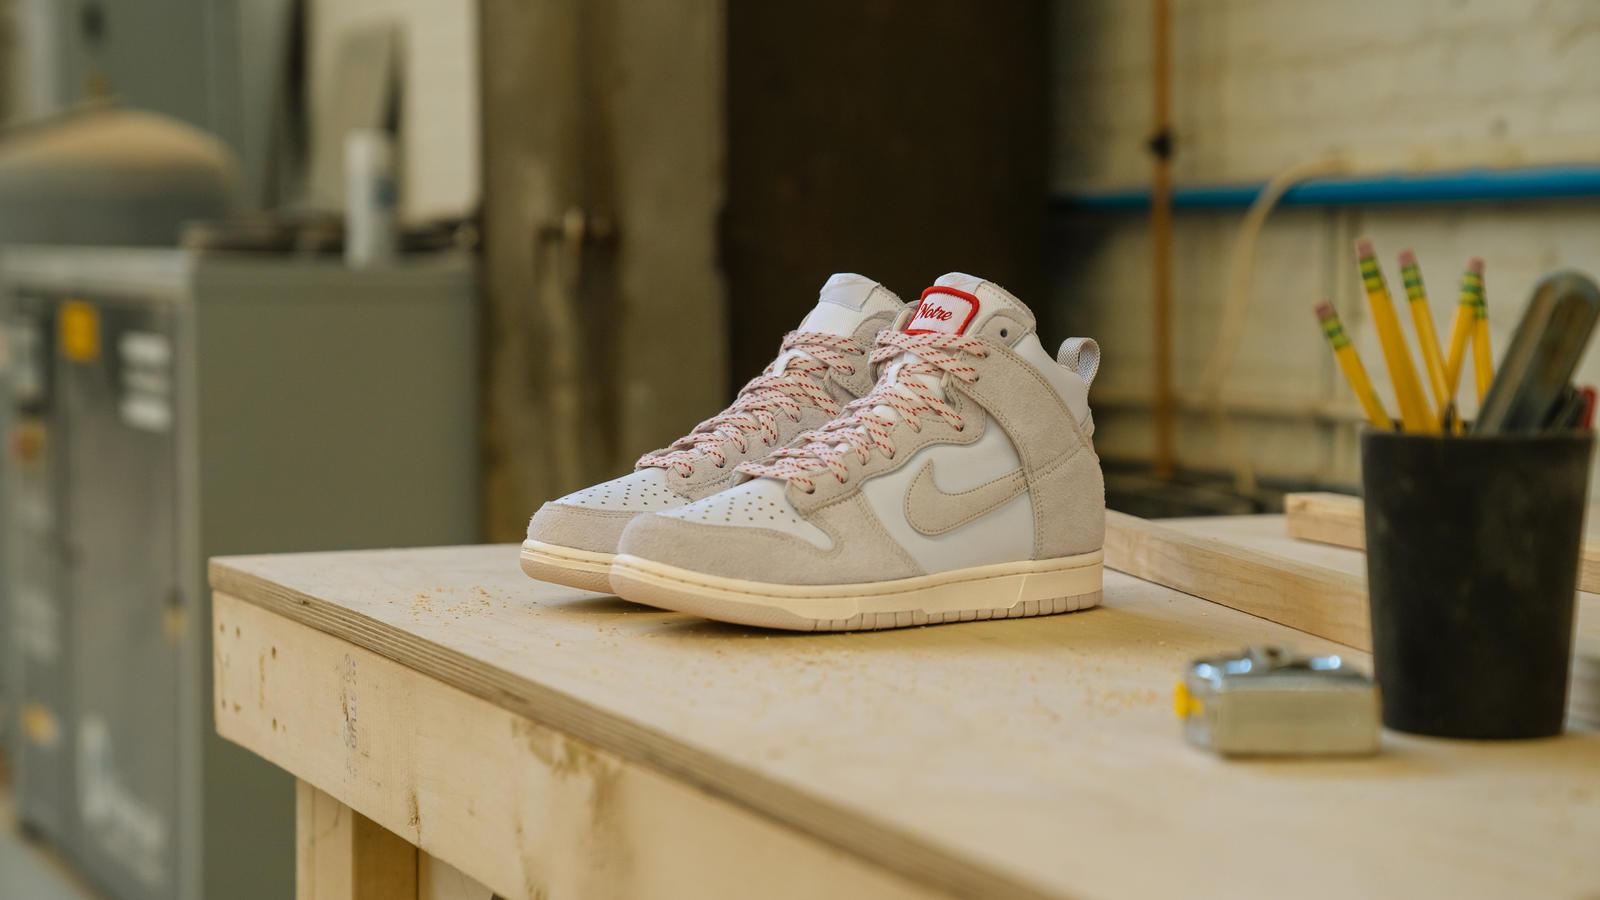 Nike x Notre Dunk High 7